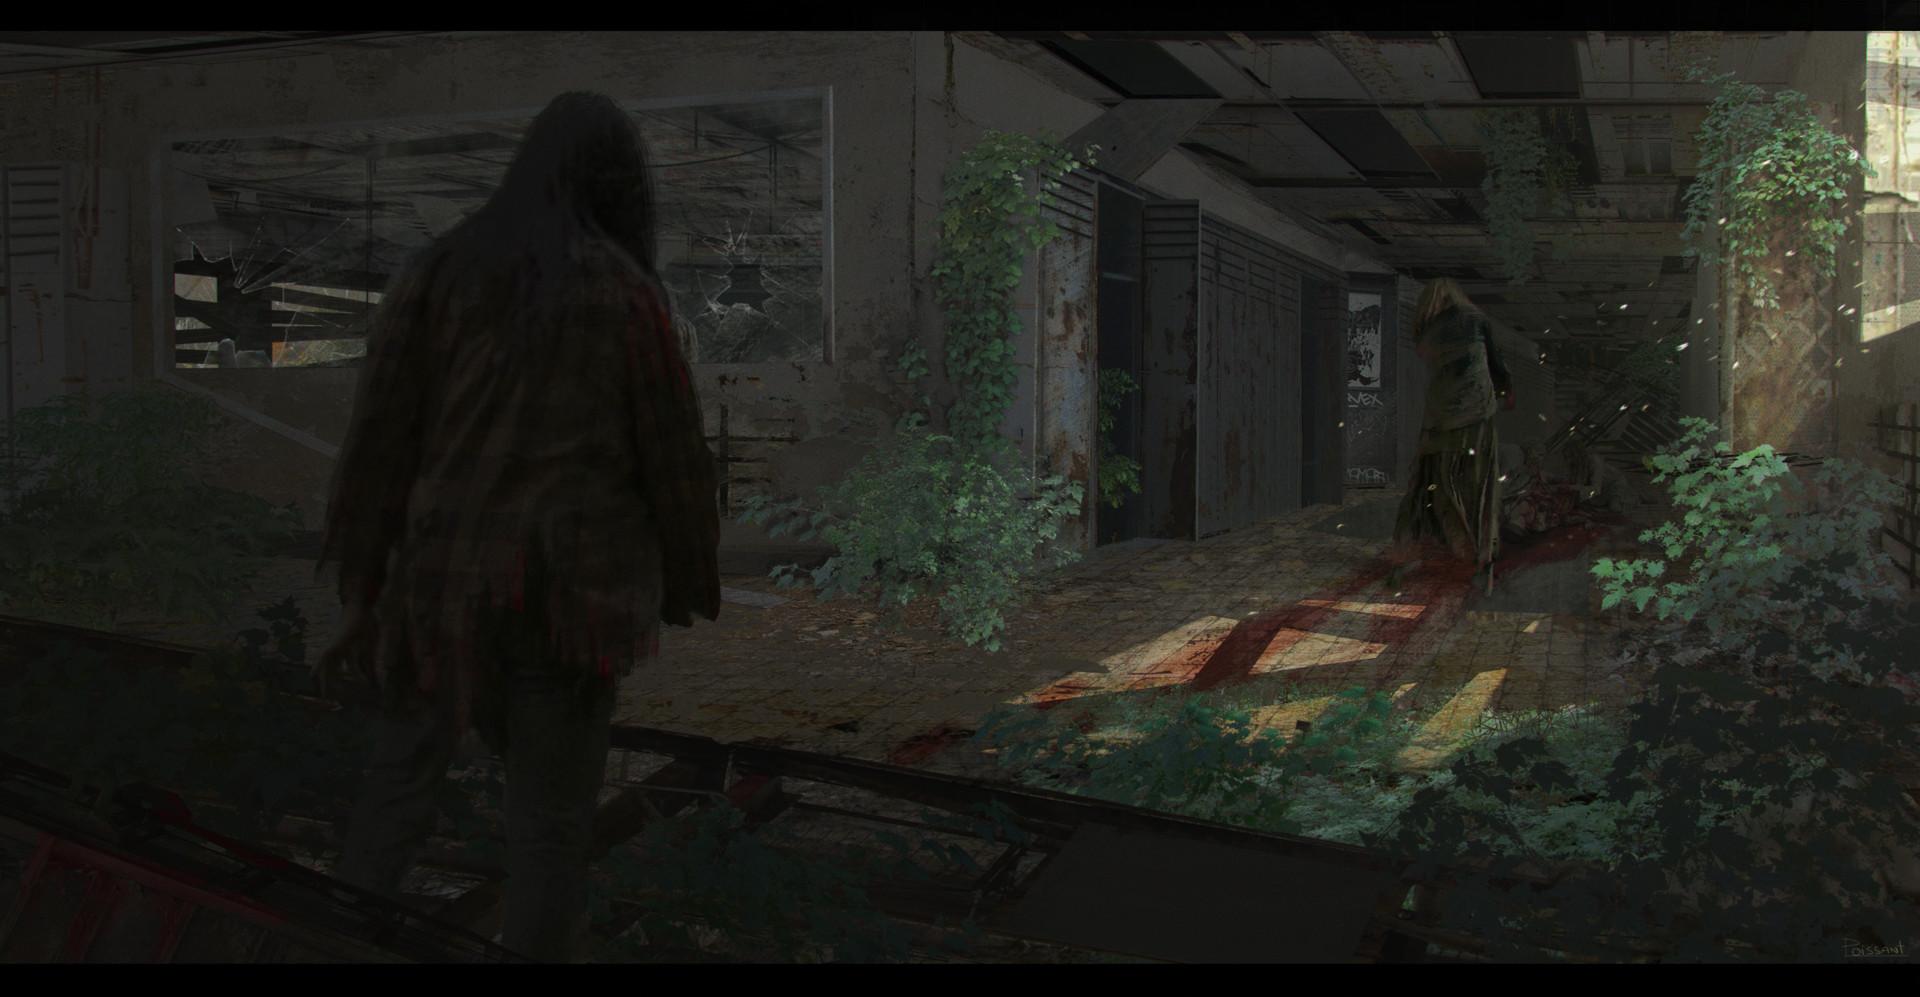 Emile poissant walkingdead fanart